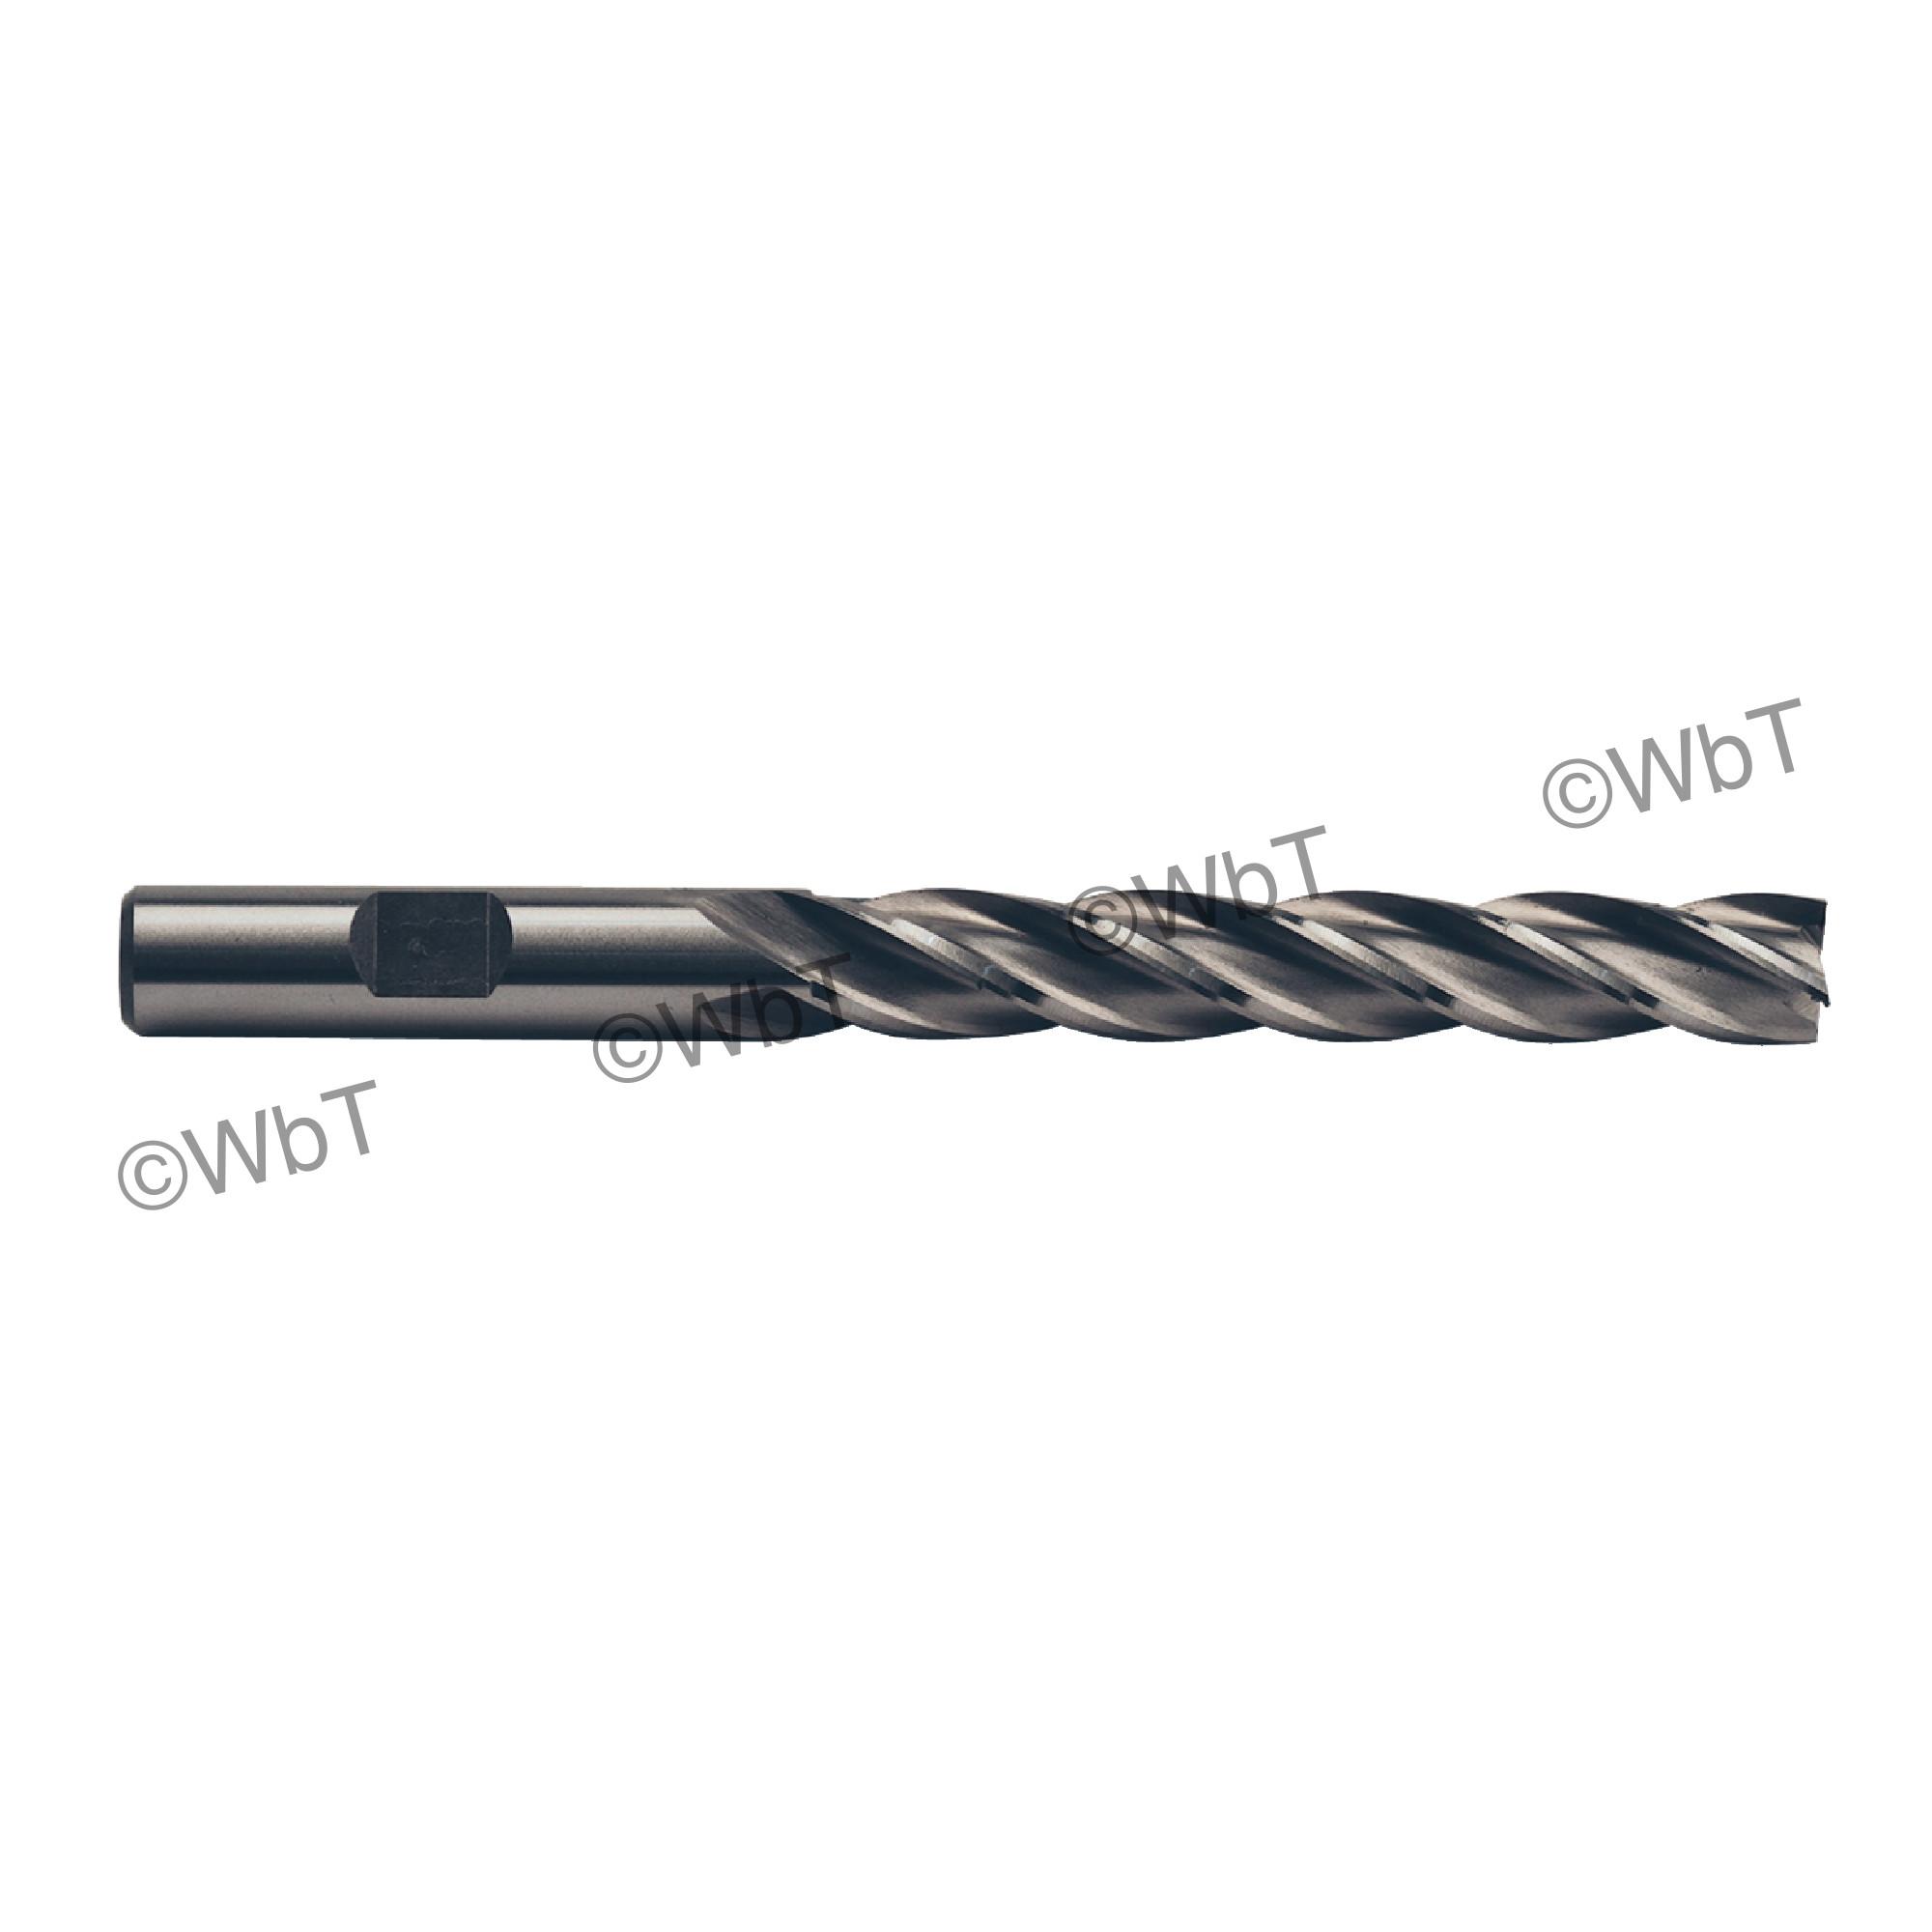 "1"" Multi Flute Center Cutting X-Long High Speed Steel End Mill"